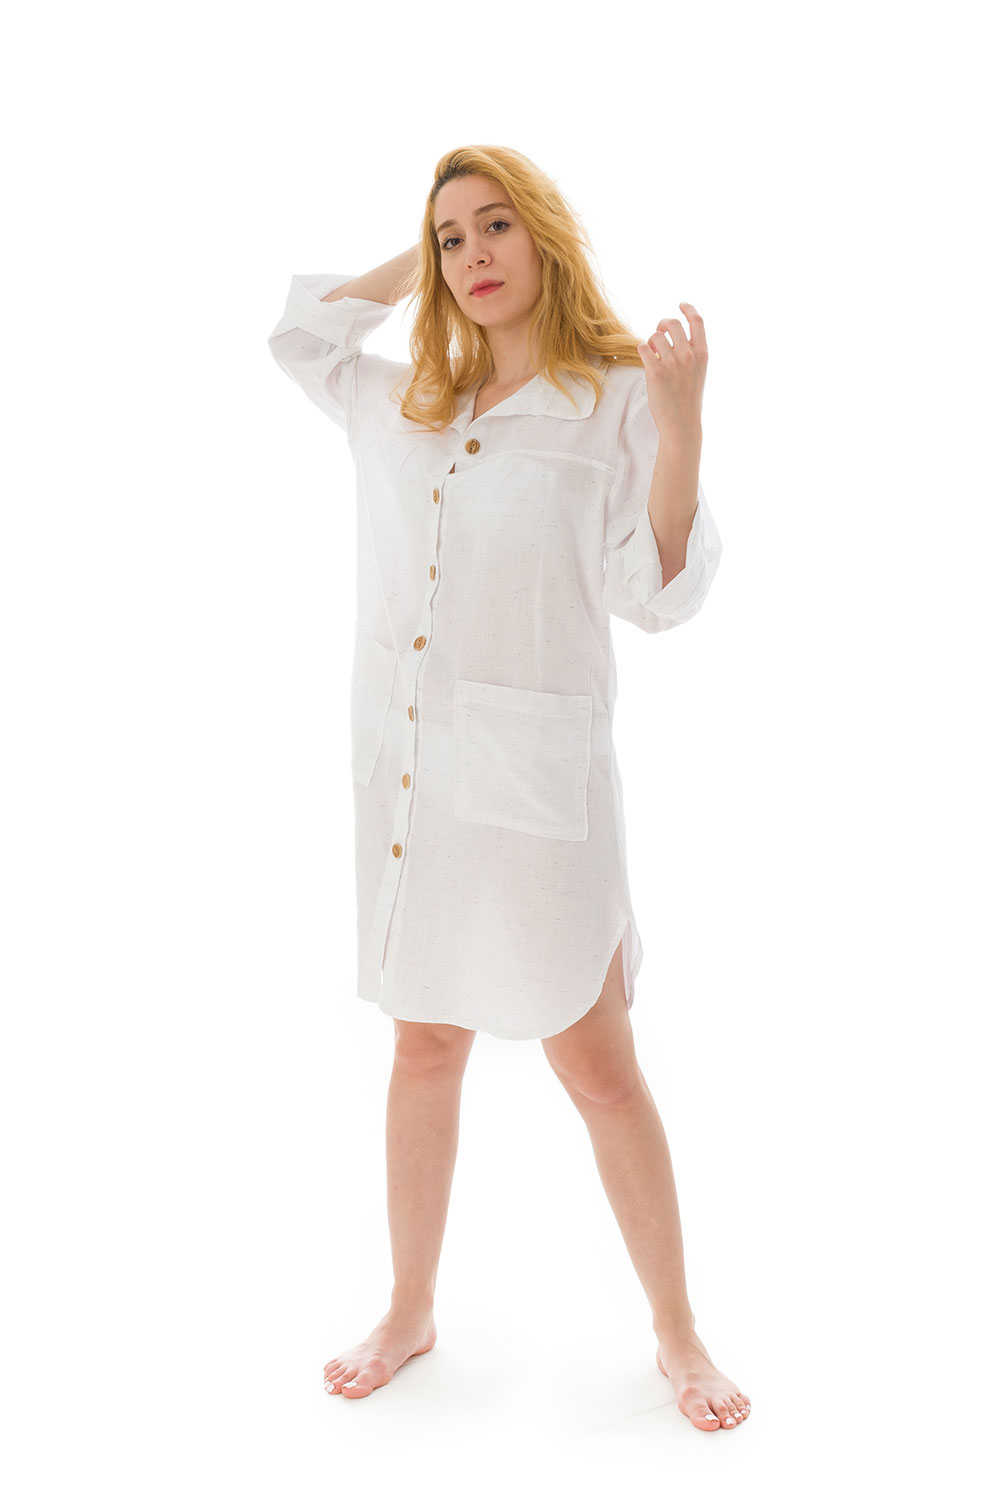 PANSY BEACH DRESS